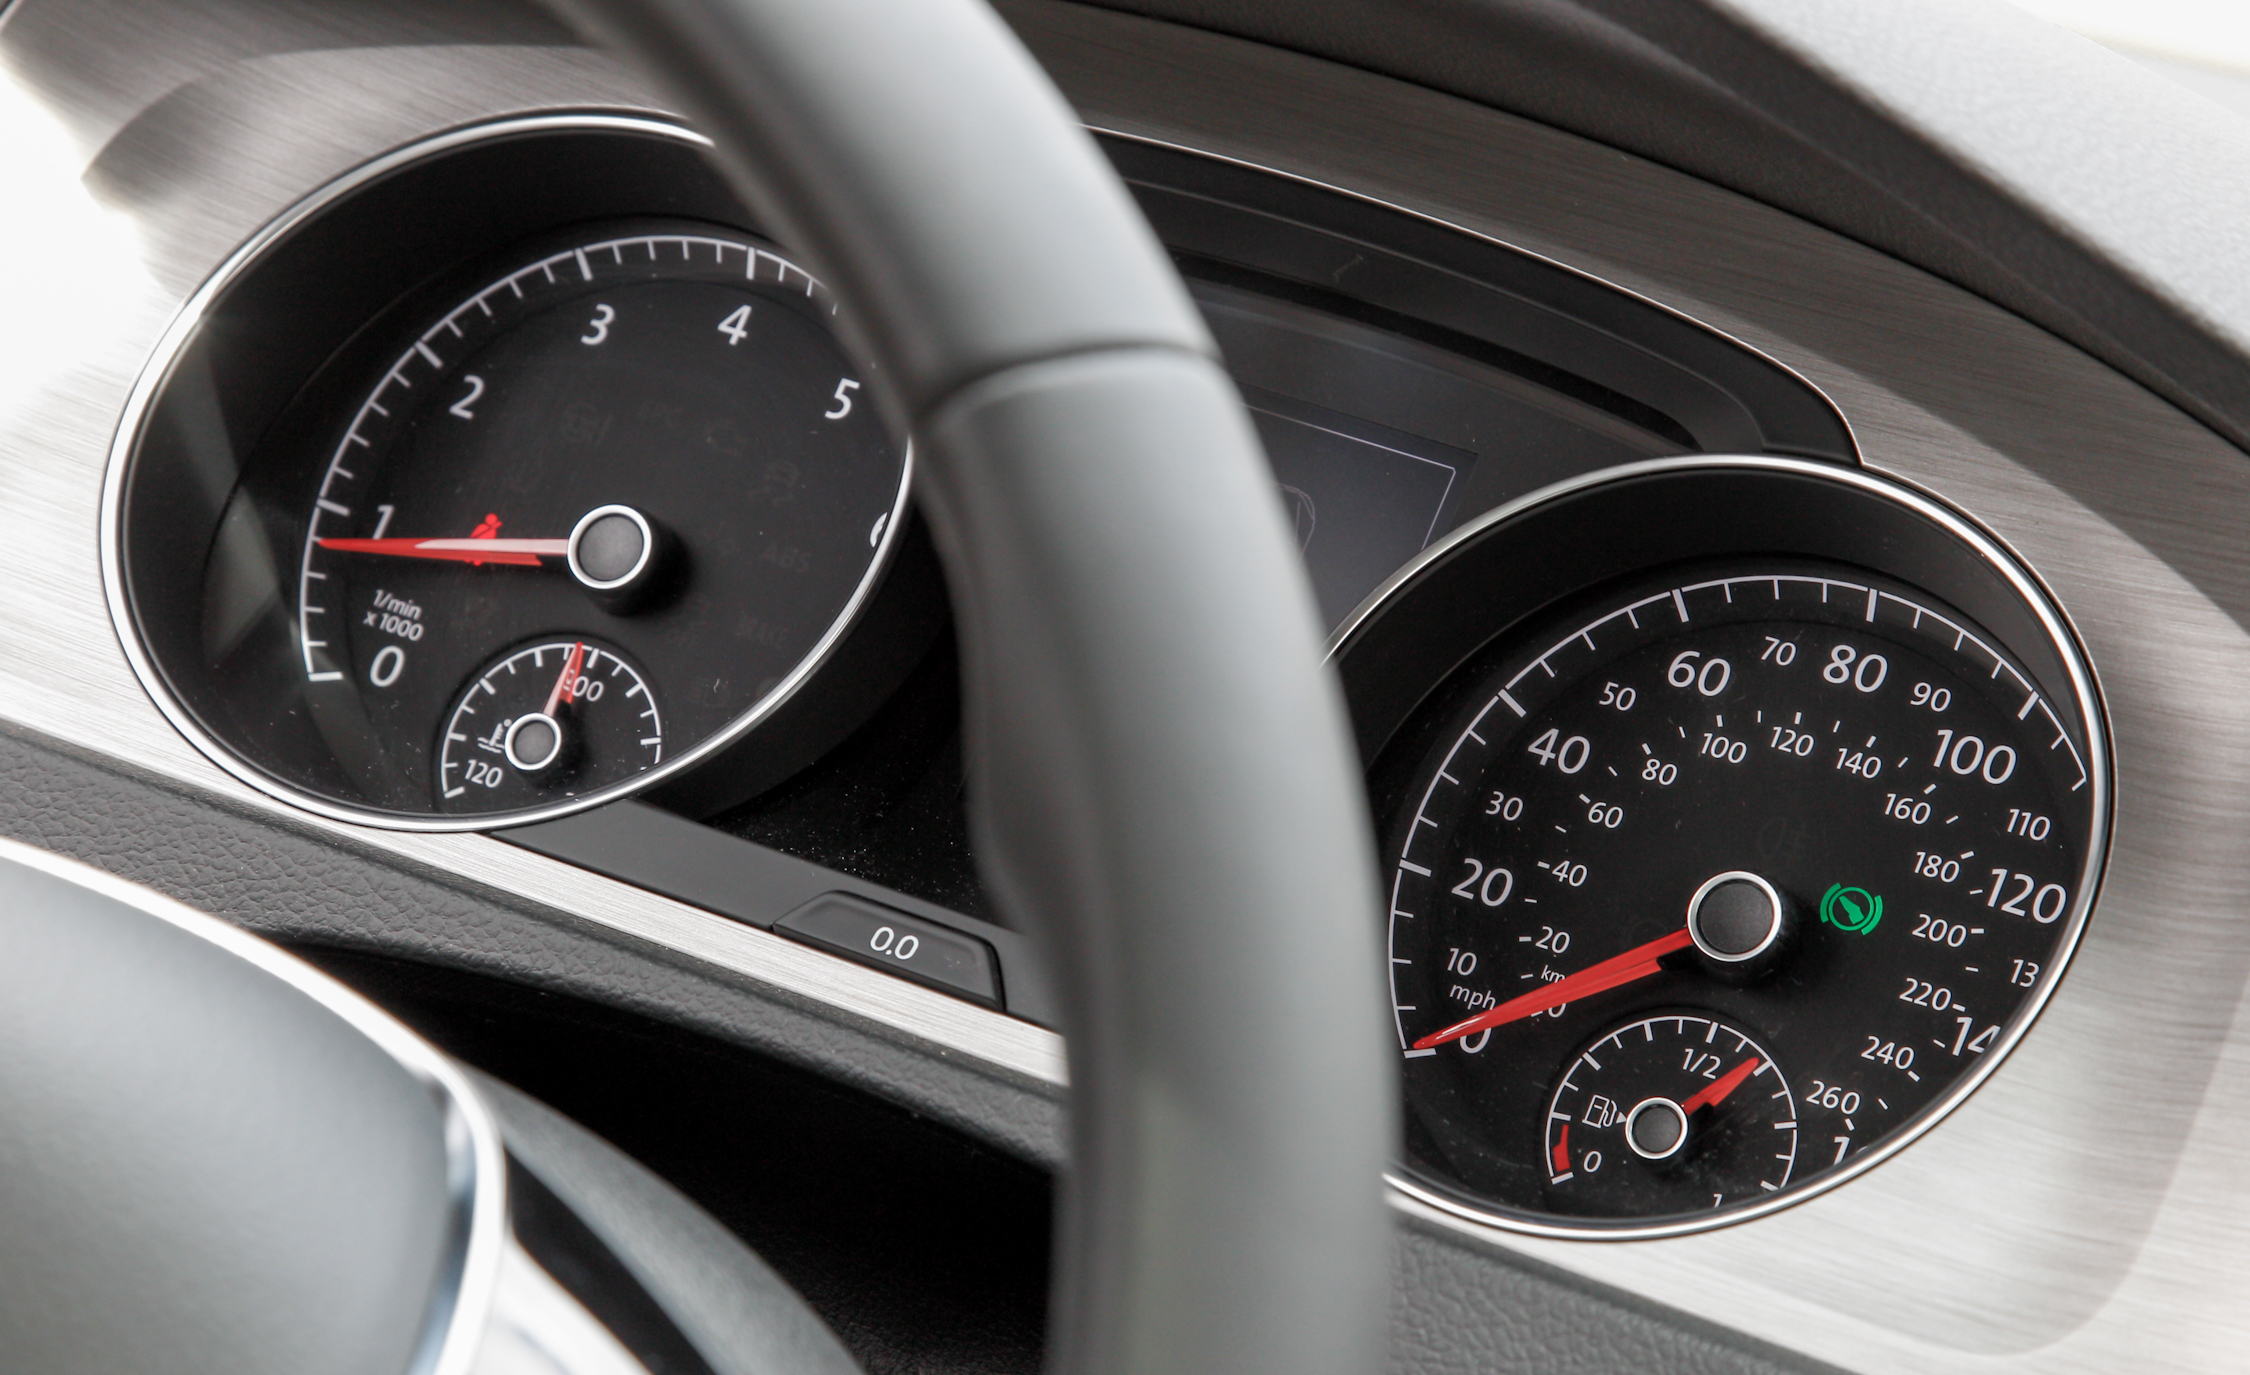 2015 Volkswagen Golf 1.8T TSI Interior Speedometer